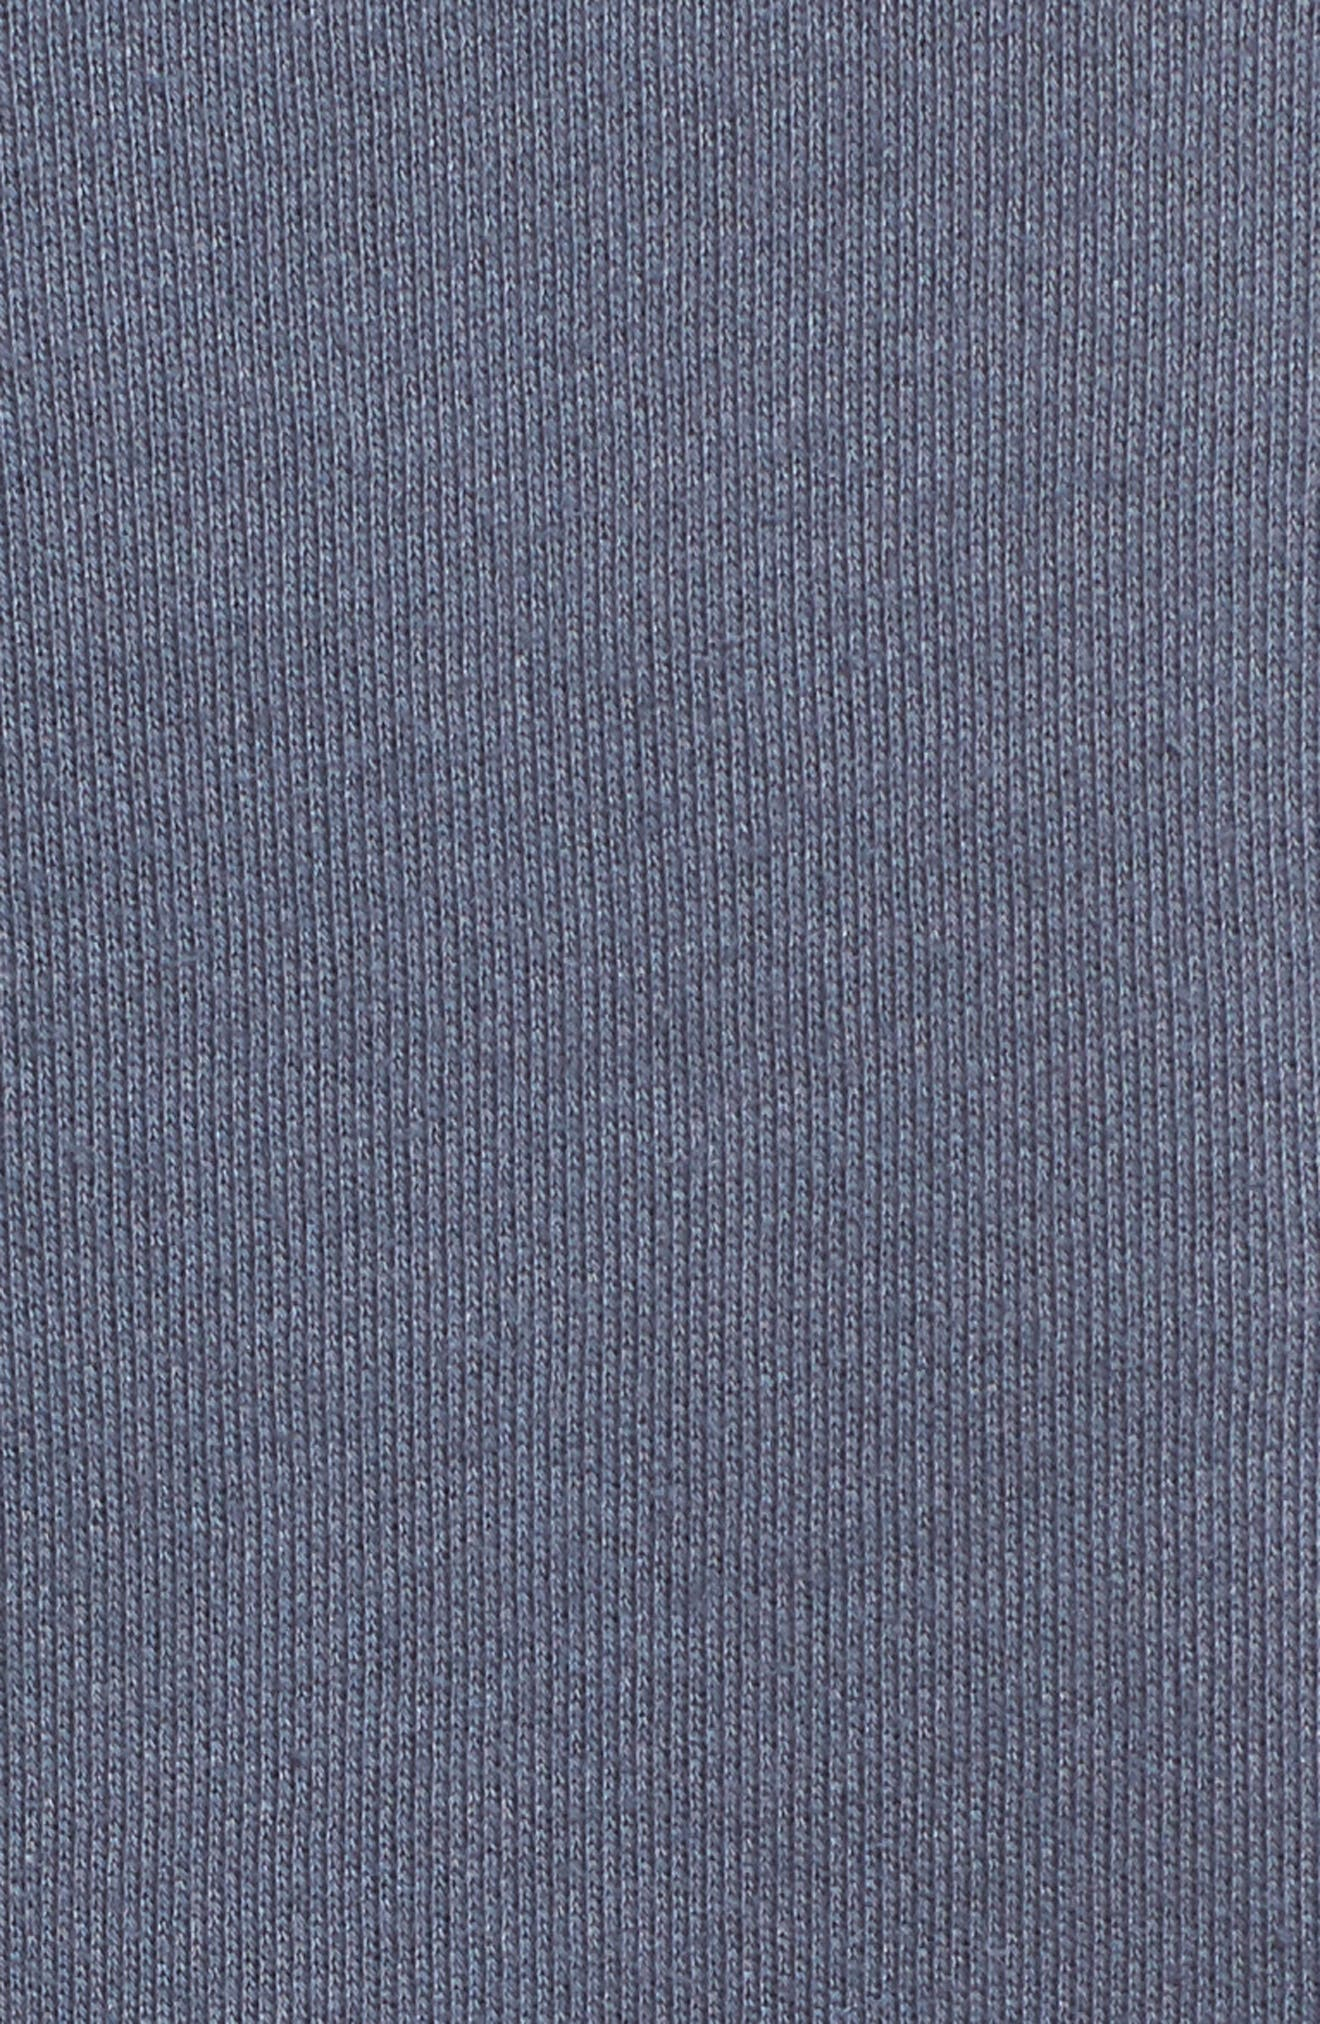 Corset Sweatshirt,                             Alternate thumbnail 5, color,                             026